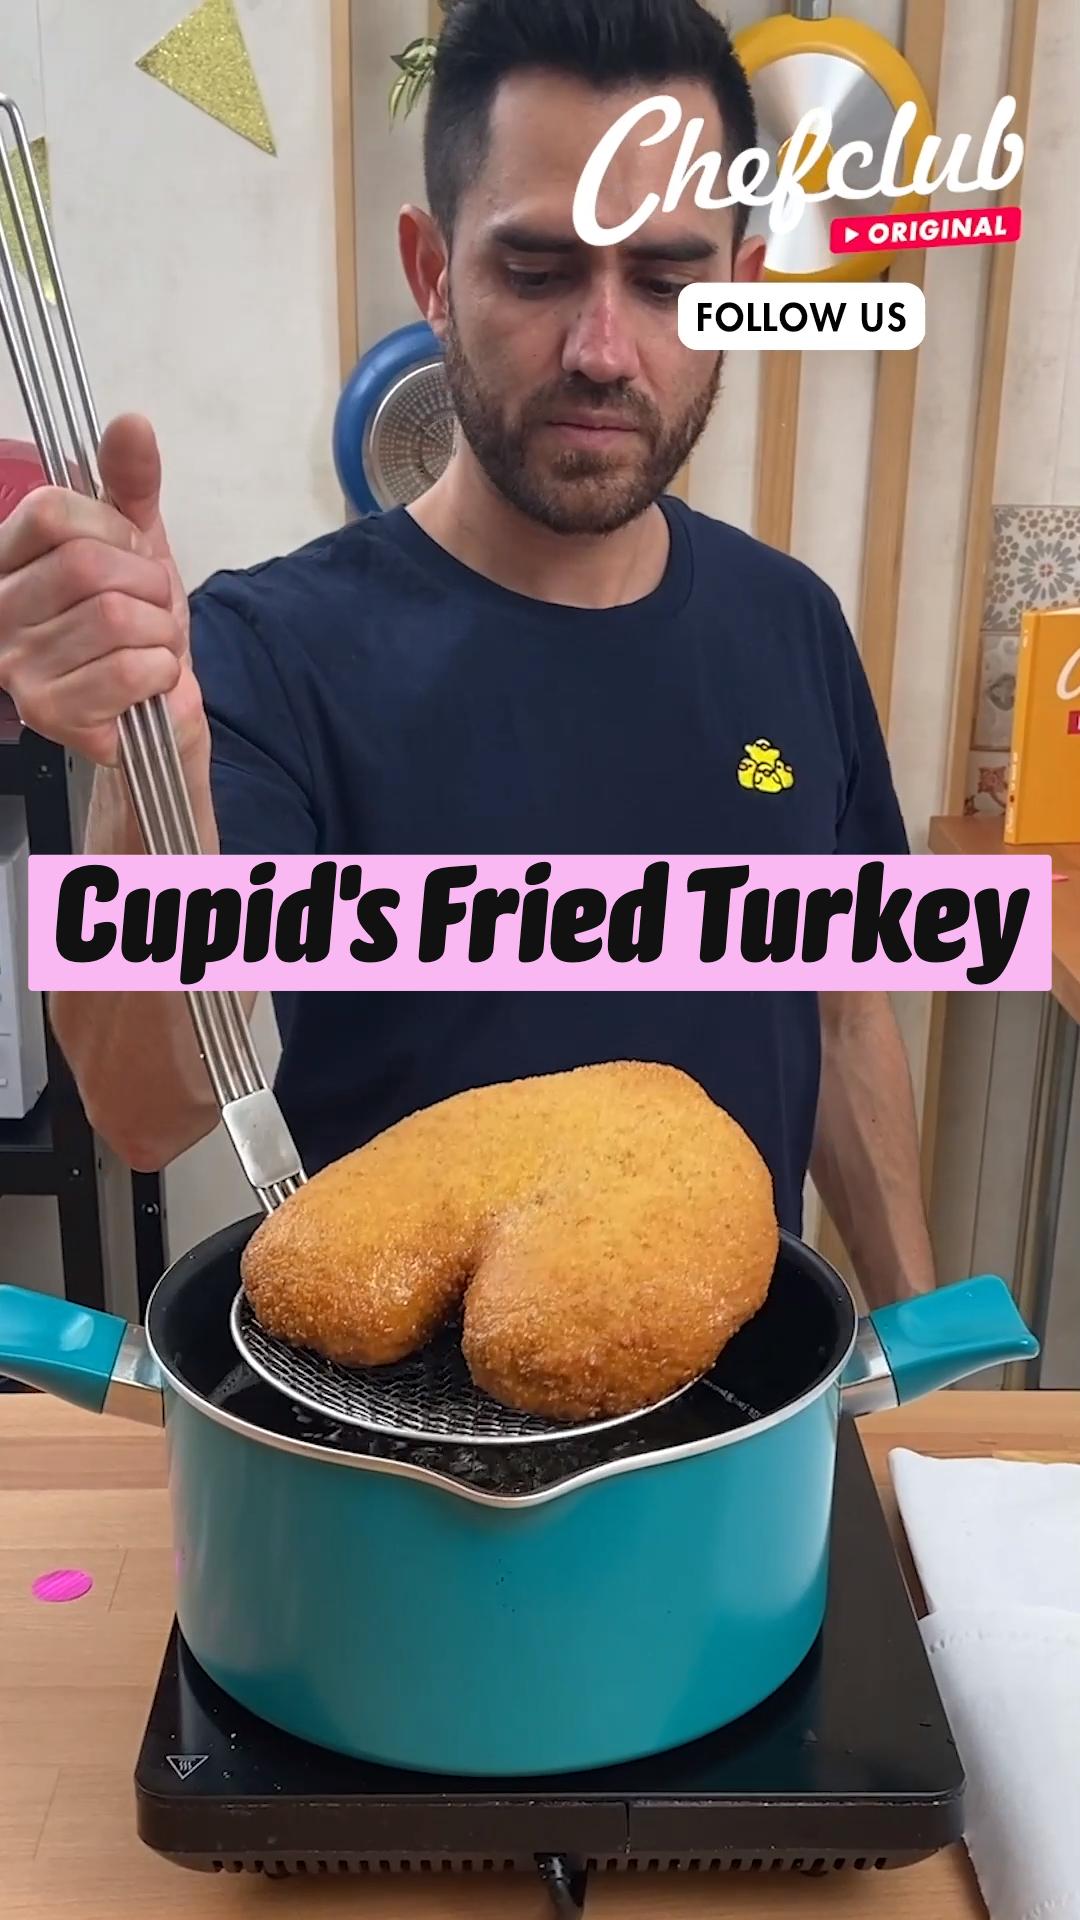 Cupid's Fried Turkey